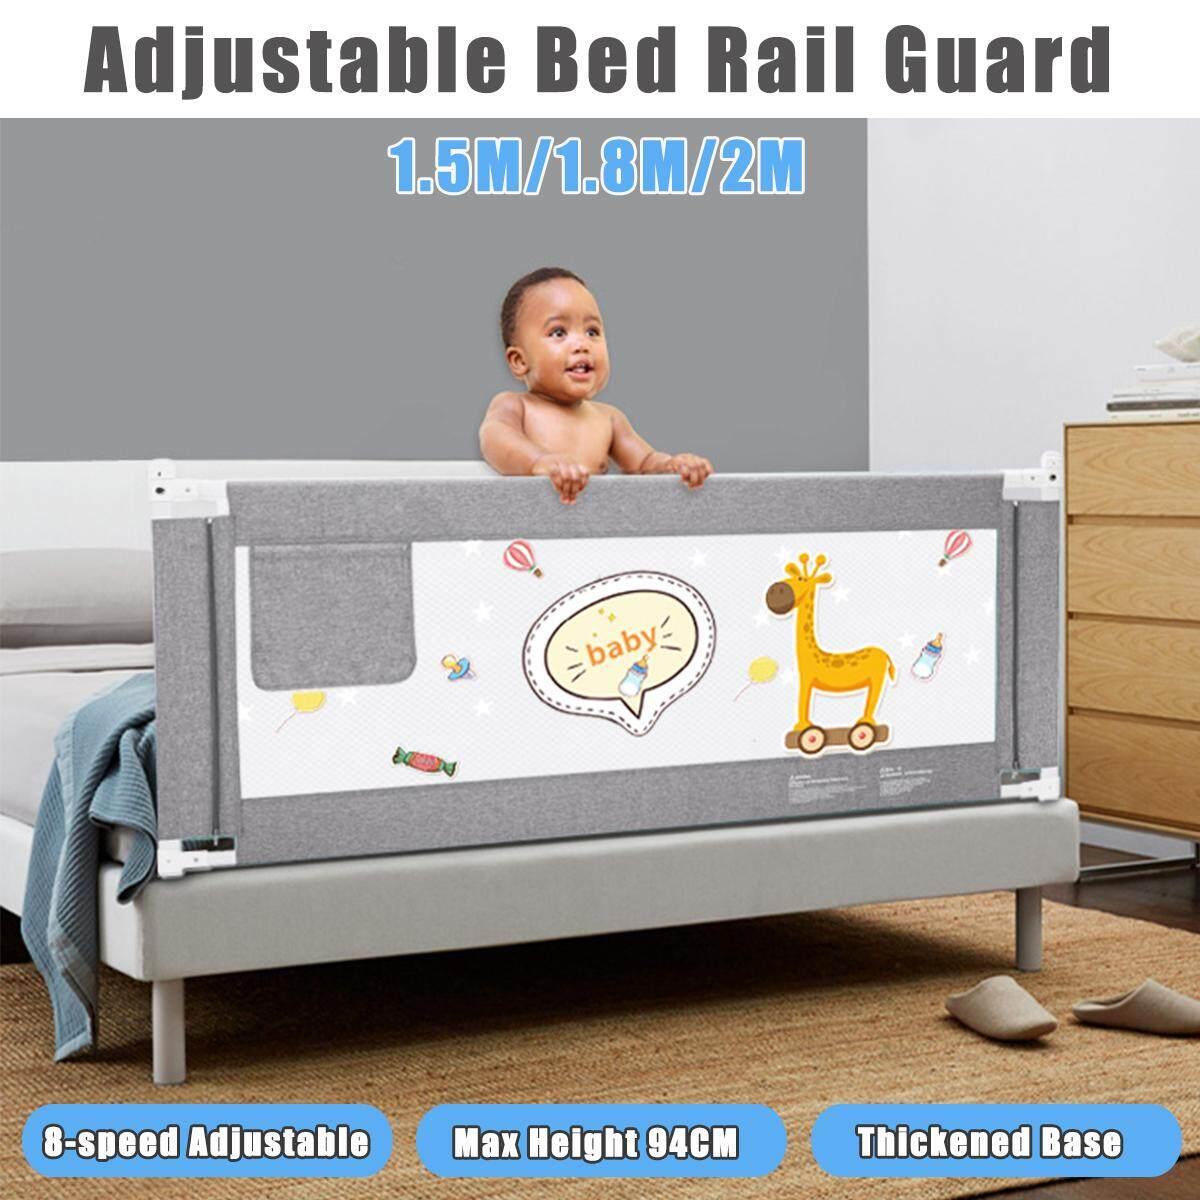 1.5M /1.8M /2M 1Pcs Gray Kid Child Bedguard Safety Toddler Bed Sleep Rail Guard Giá Giảm